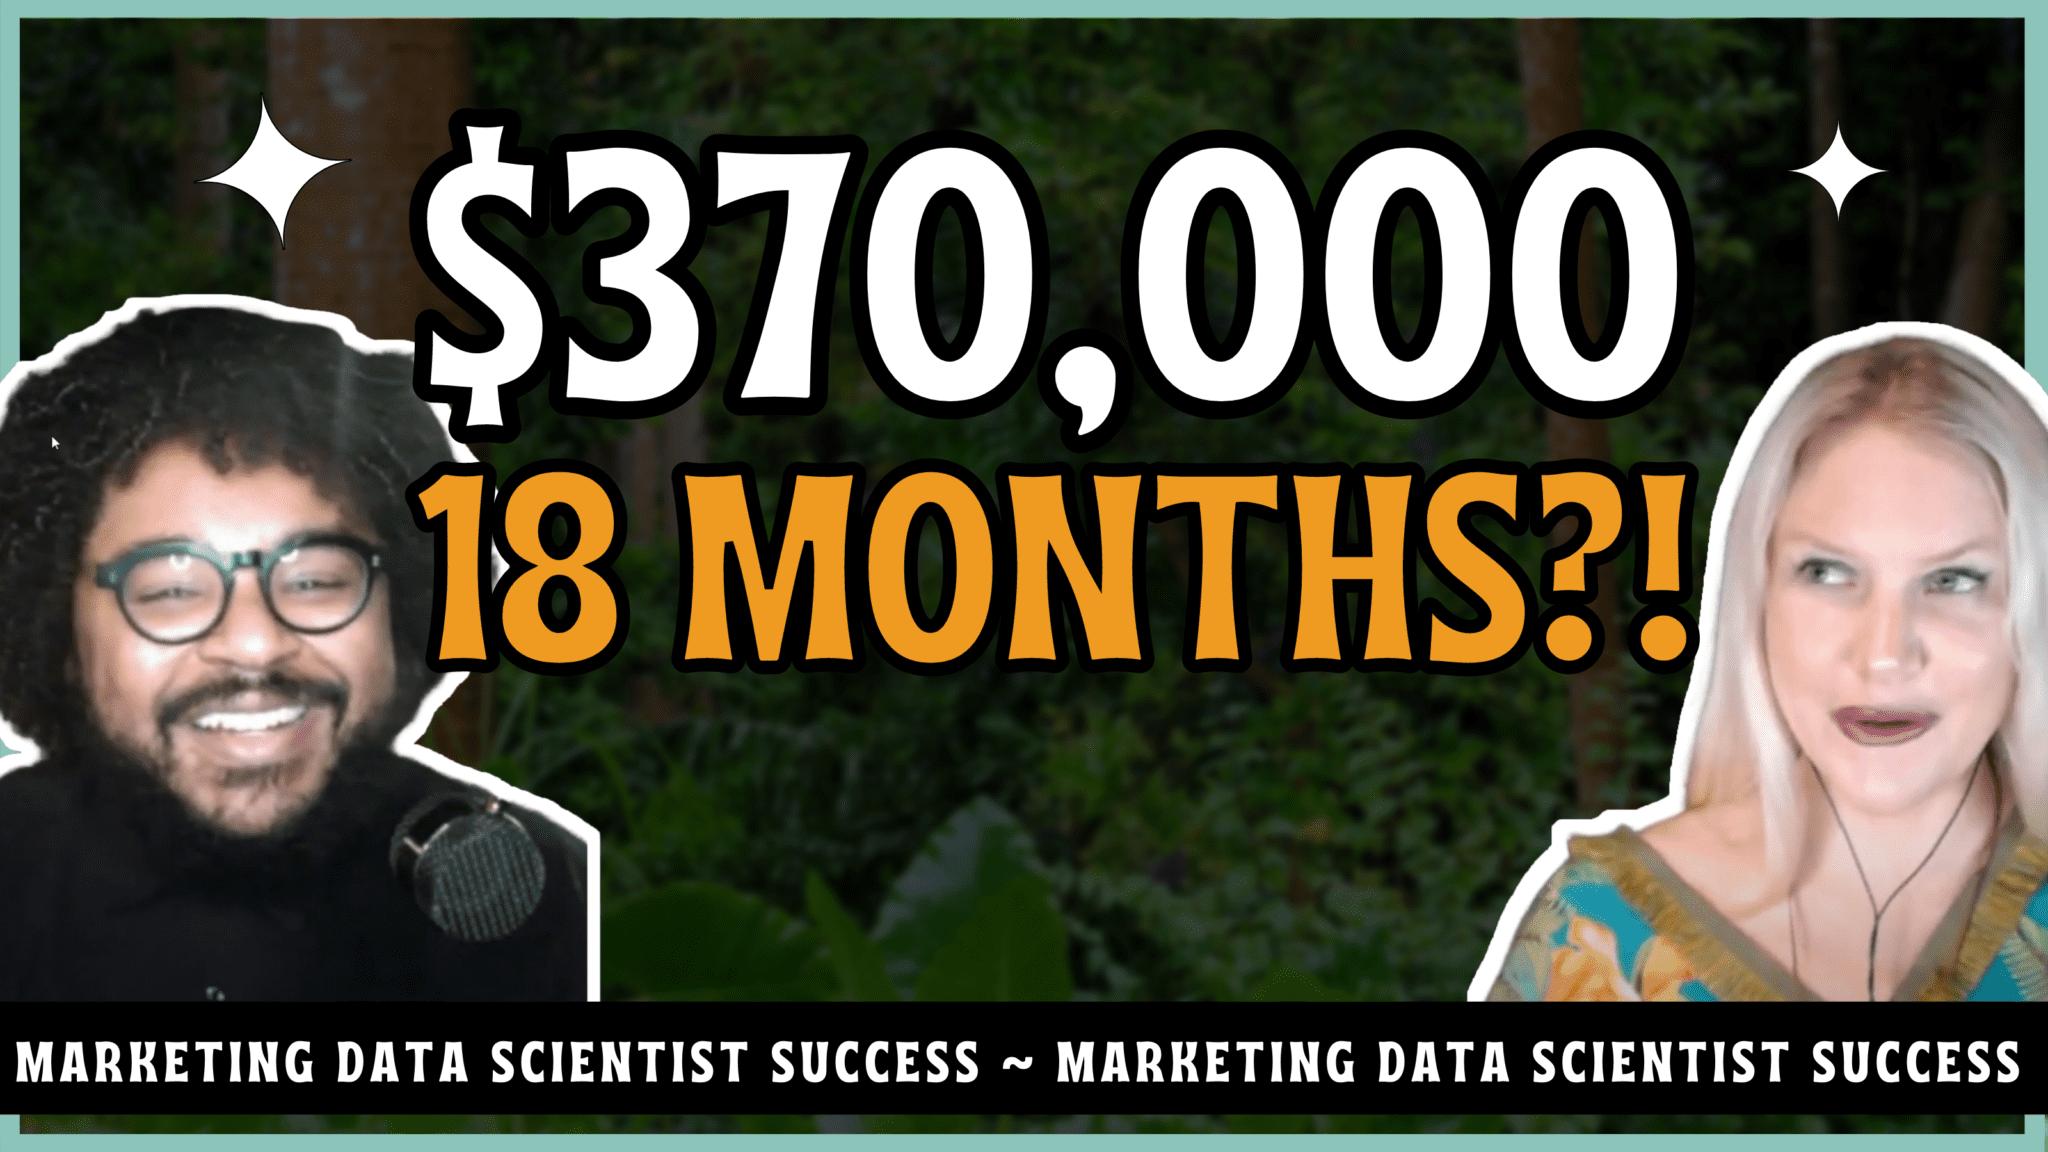 Marketing data scientist success story